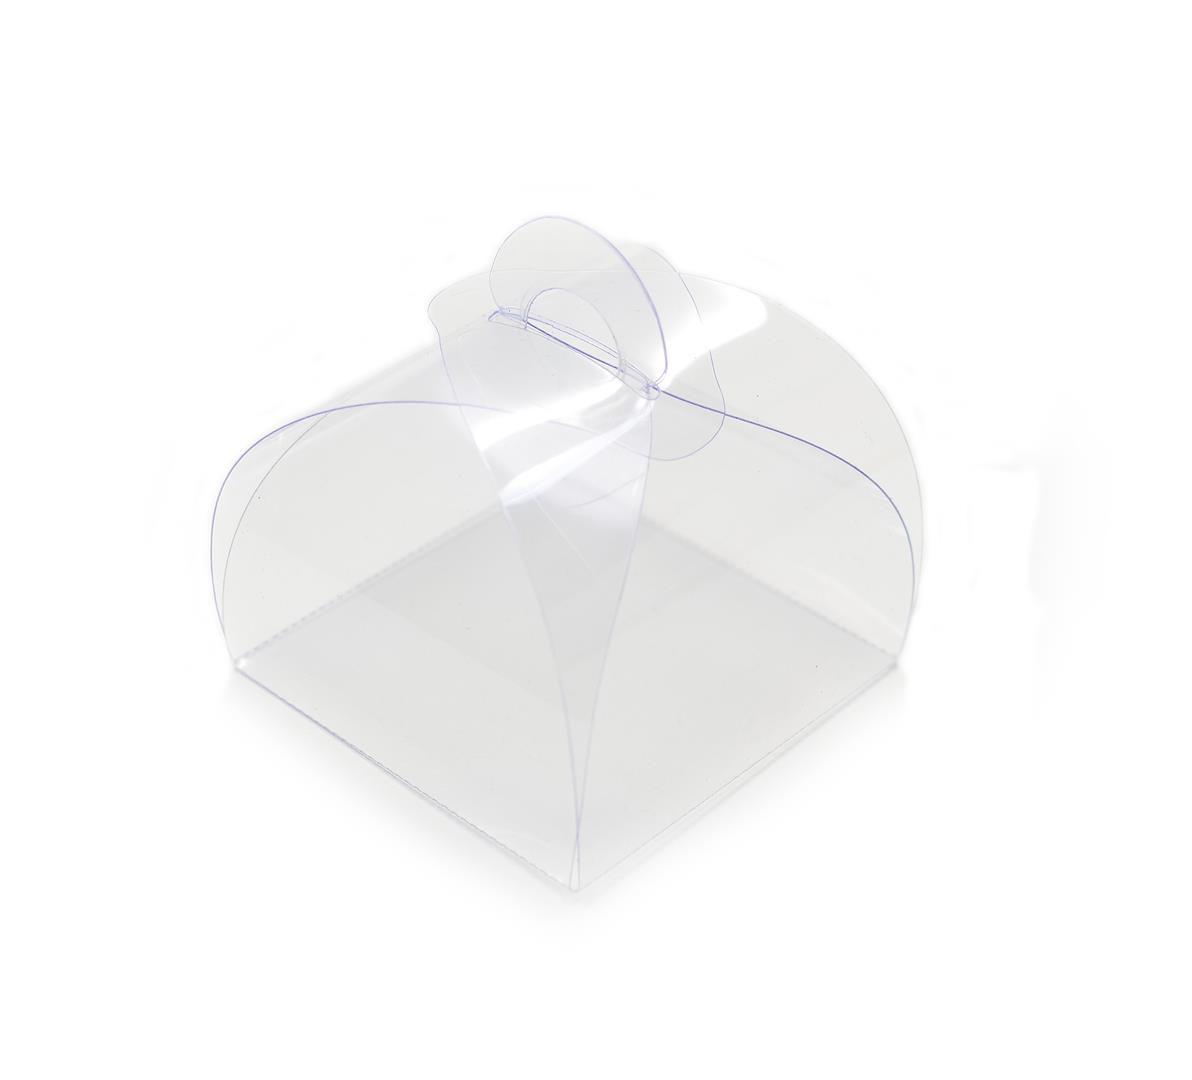 034 Maleta - 6x6x5 cm - Transparente